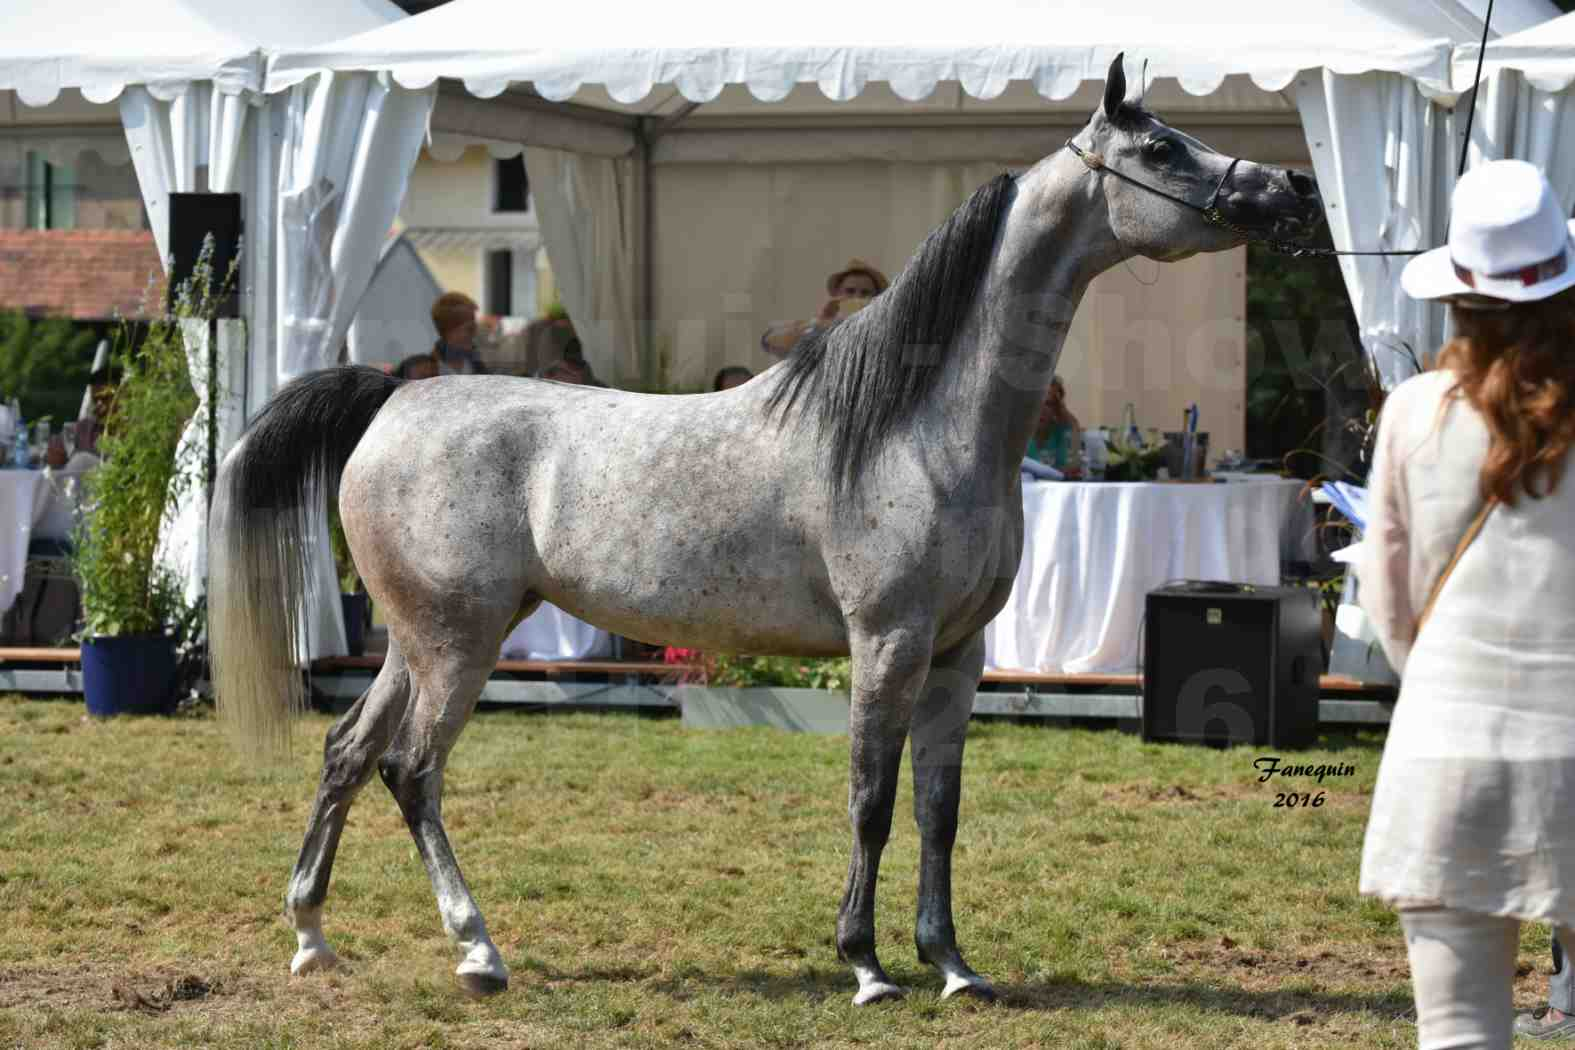 International Arabian Horse Show B de VICHY 2016 - ISABELLA - Notre Sélection - 10